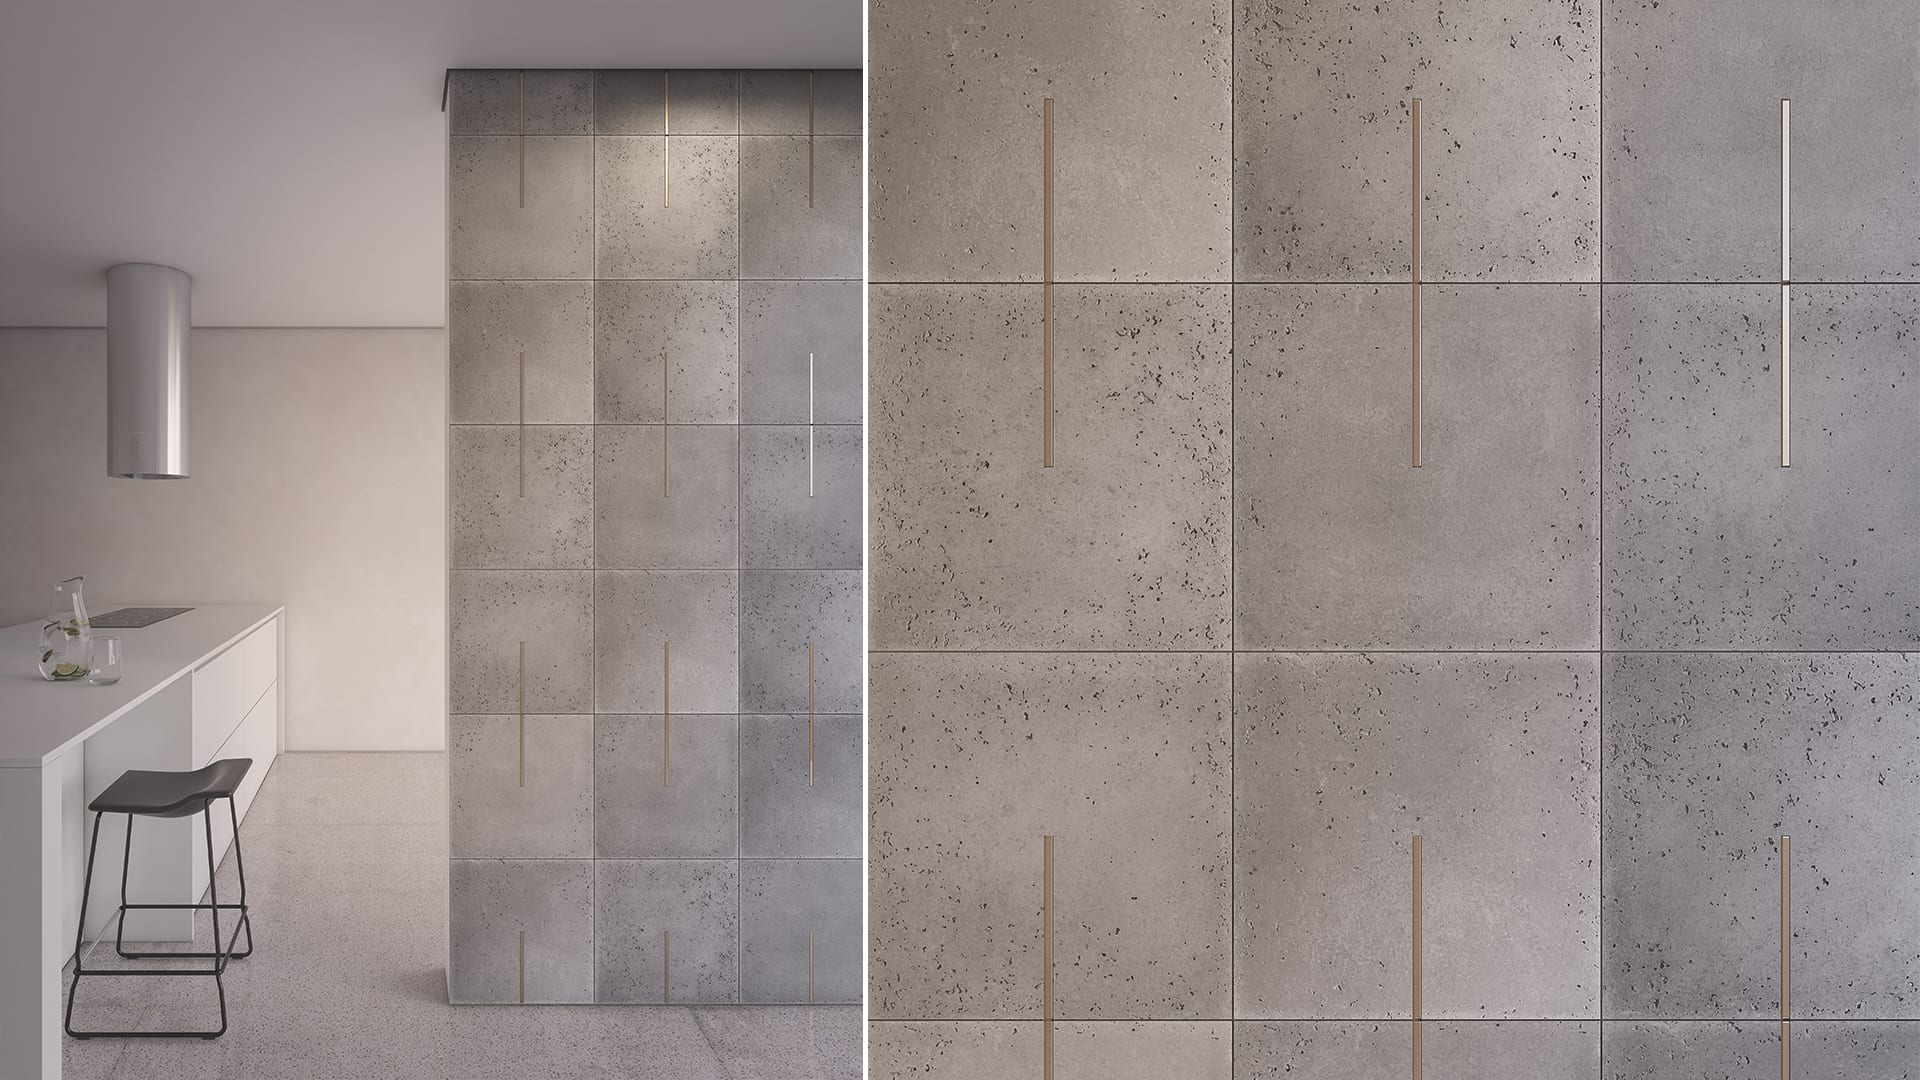 Maayan-Golan_Architectural-Visualization_product-visualization_wall-tiles_lighting-fixture_itai-bar-on_kitchen_08